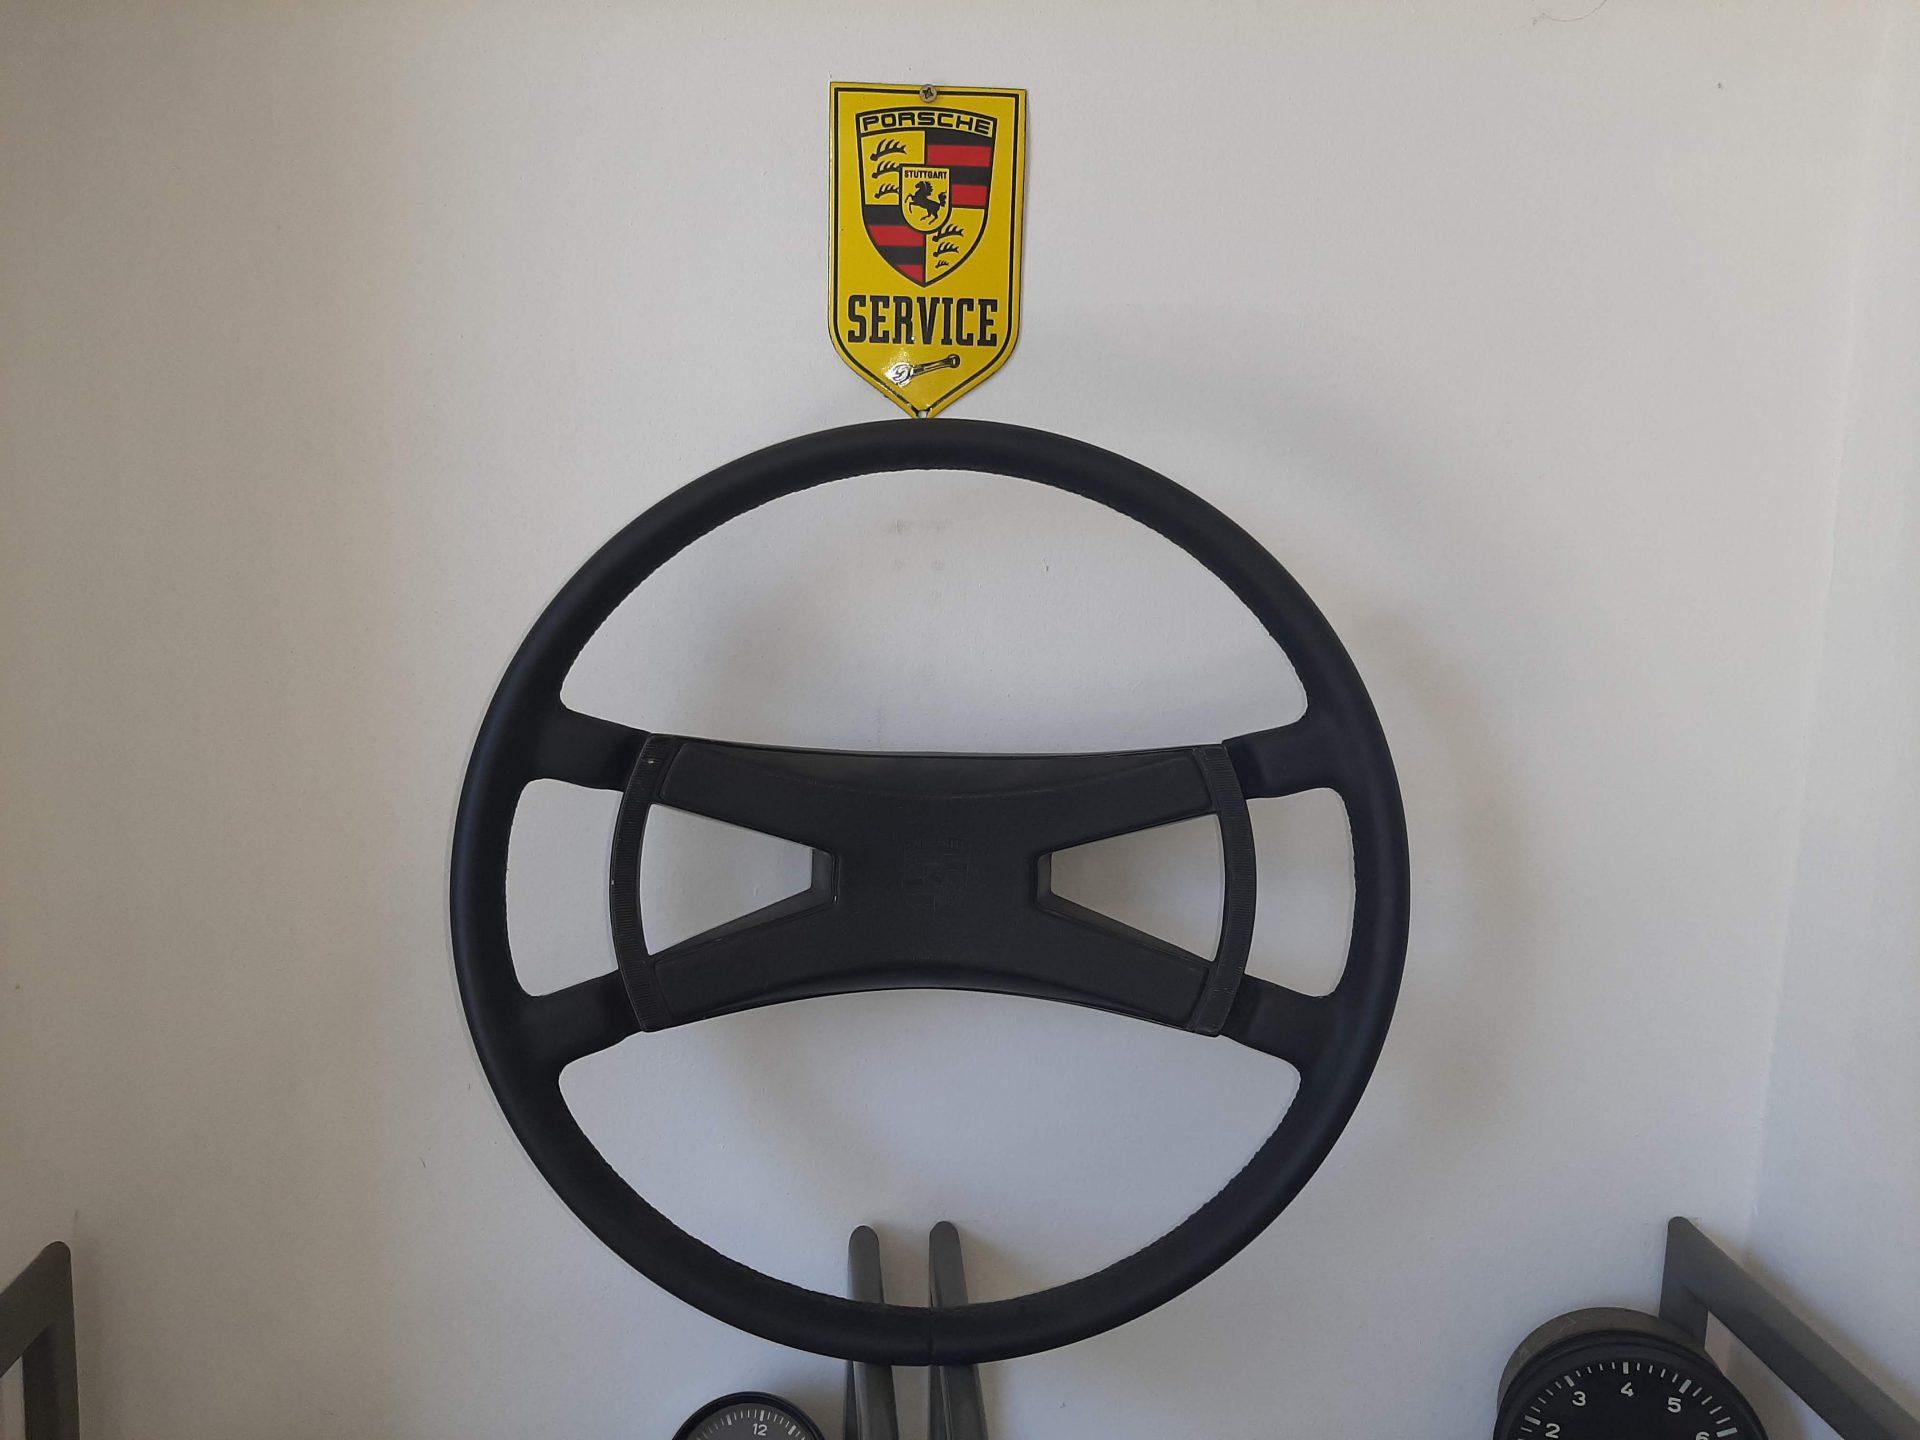 Lenkrad 40cm Durchmesser Image